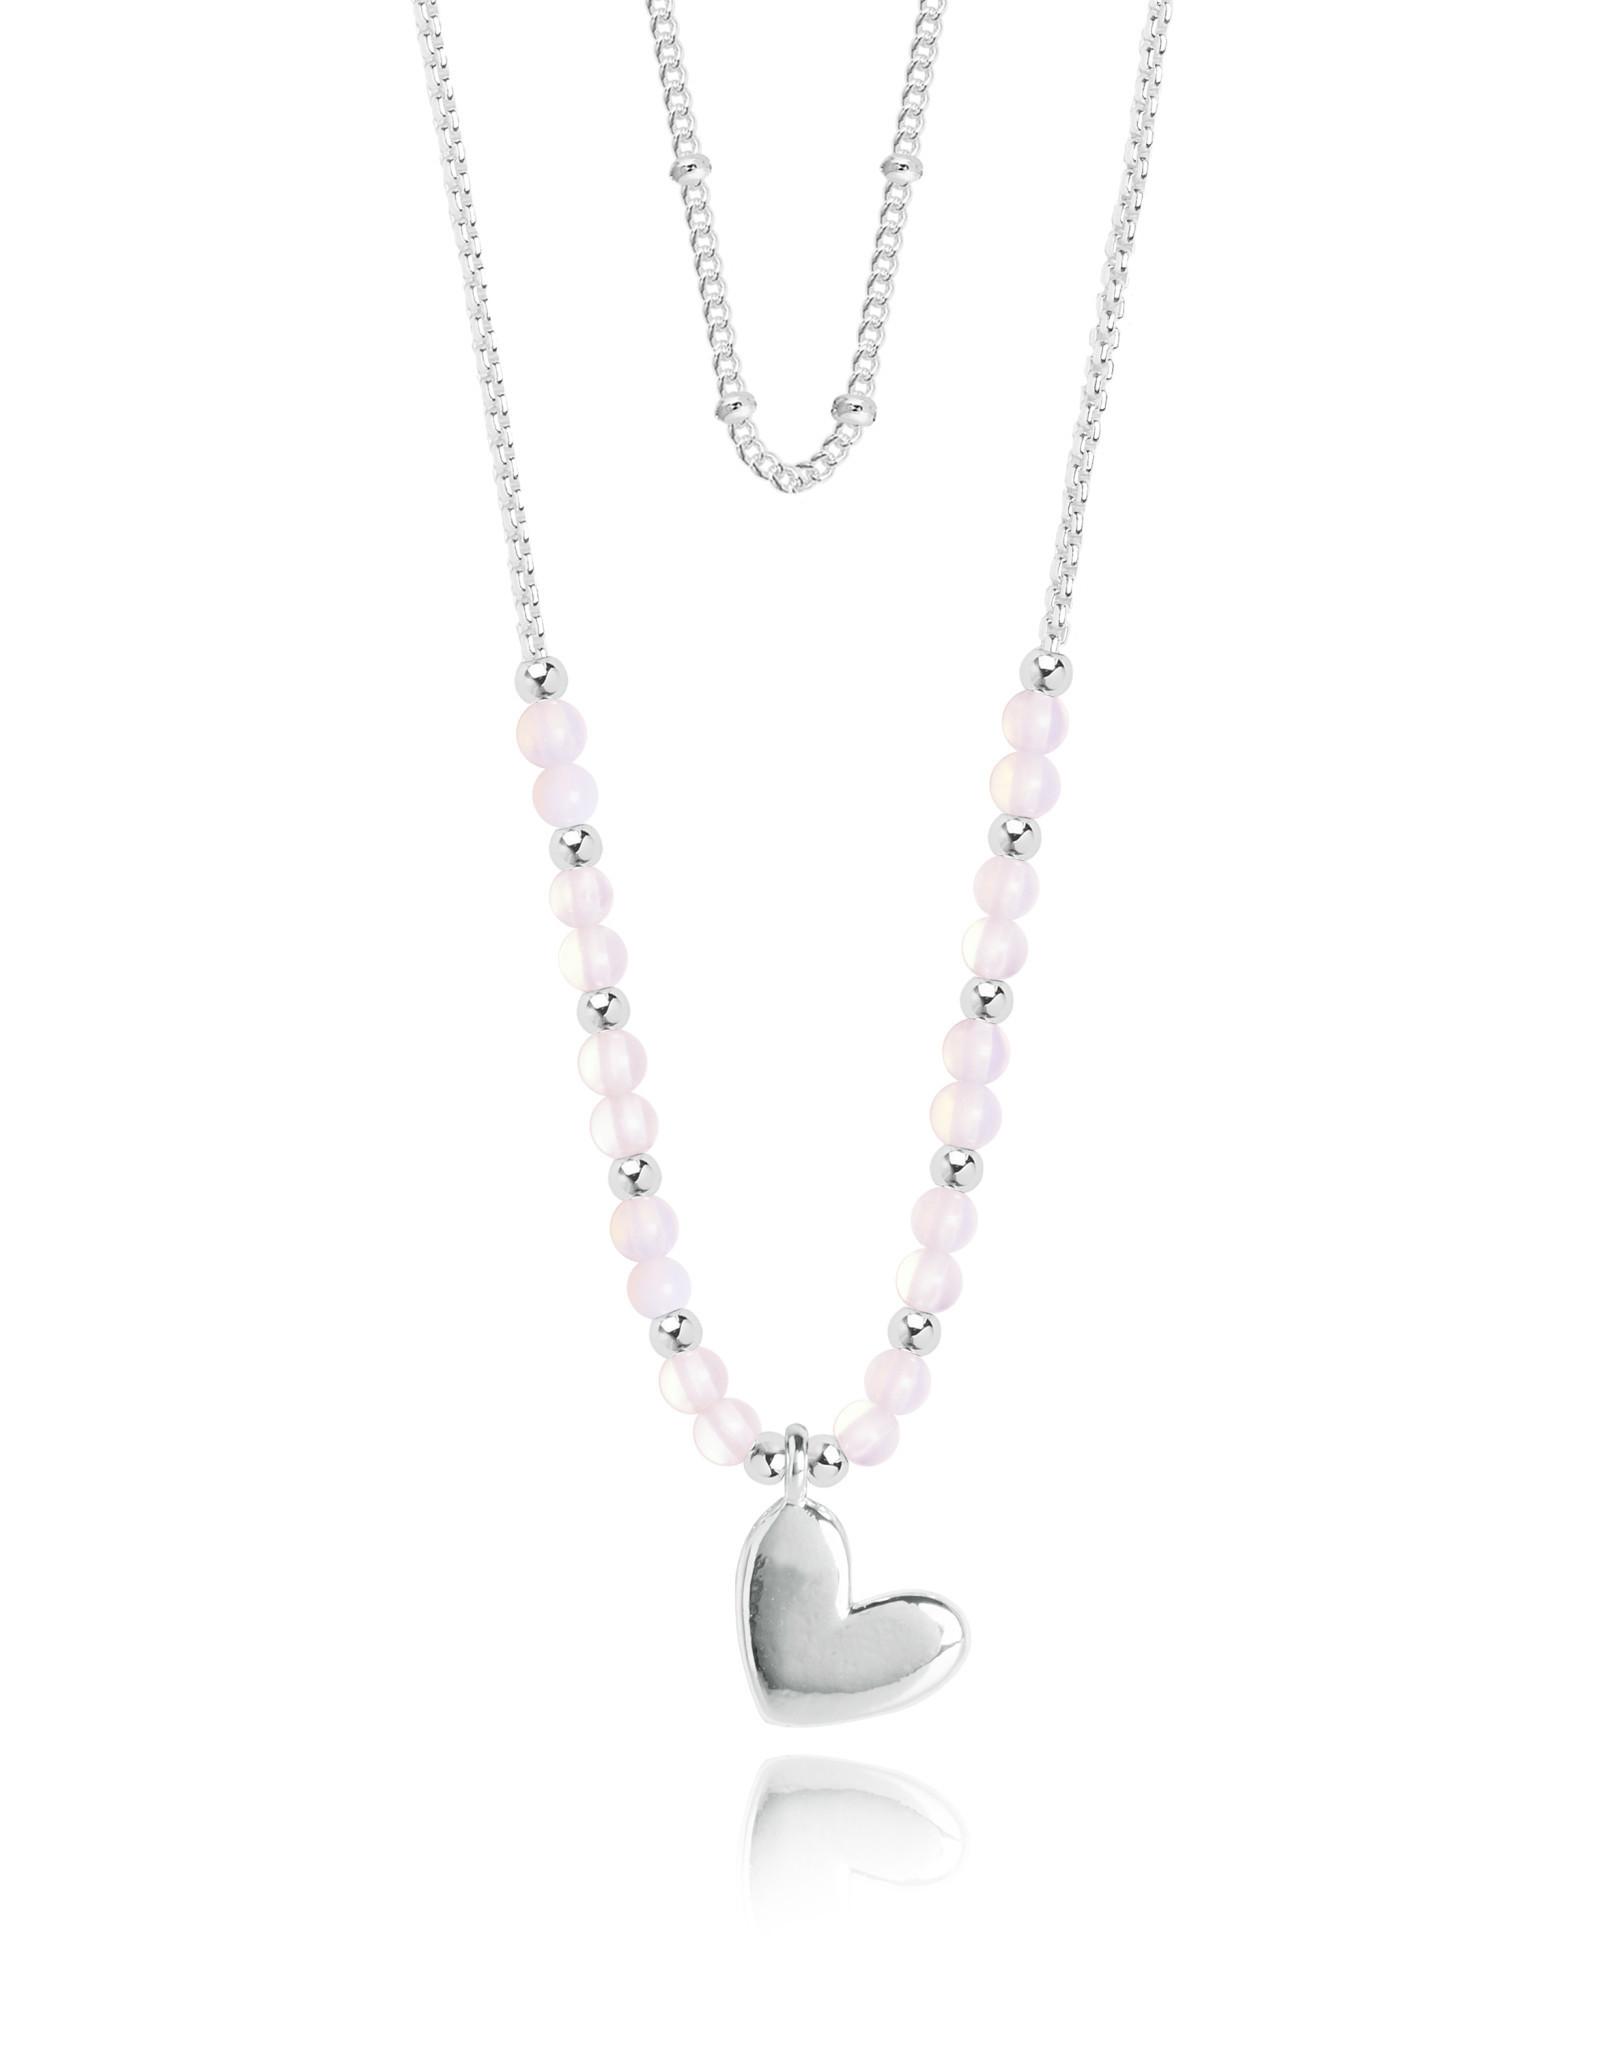 Katie Loxton KLSS - Love Necklace - Silver with Rose Quartz Stones Adjustable